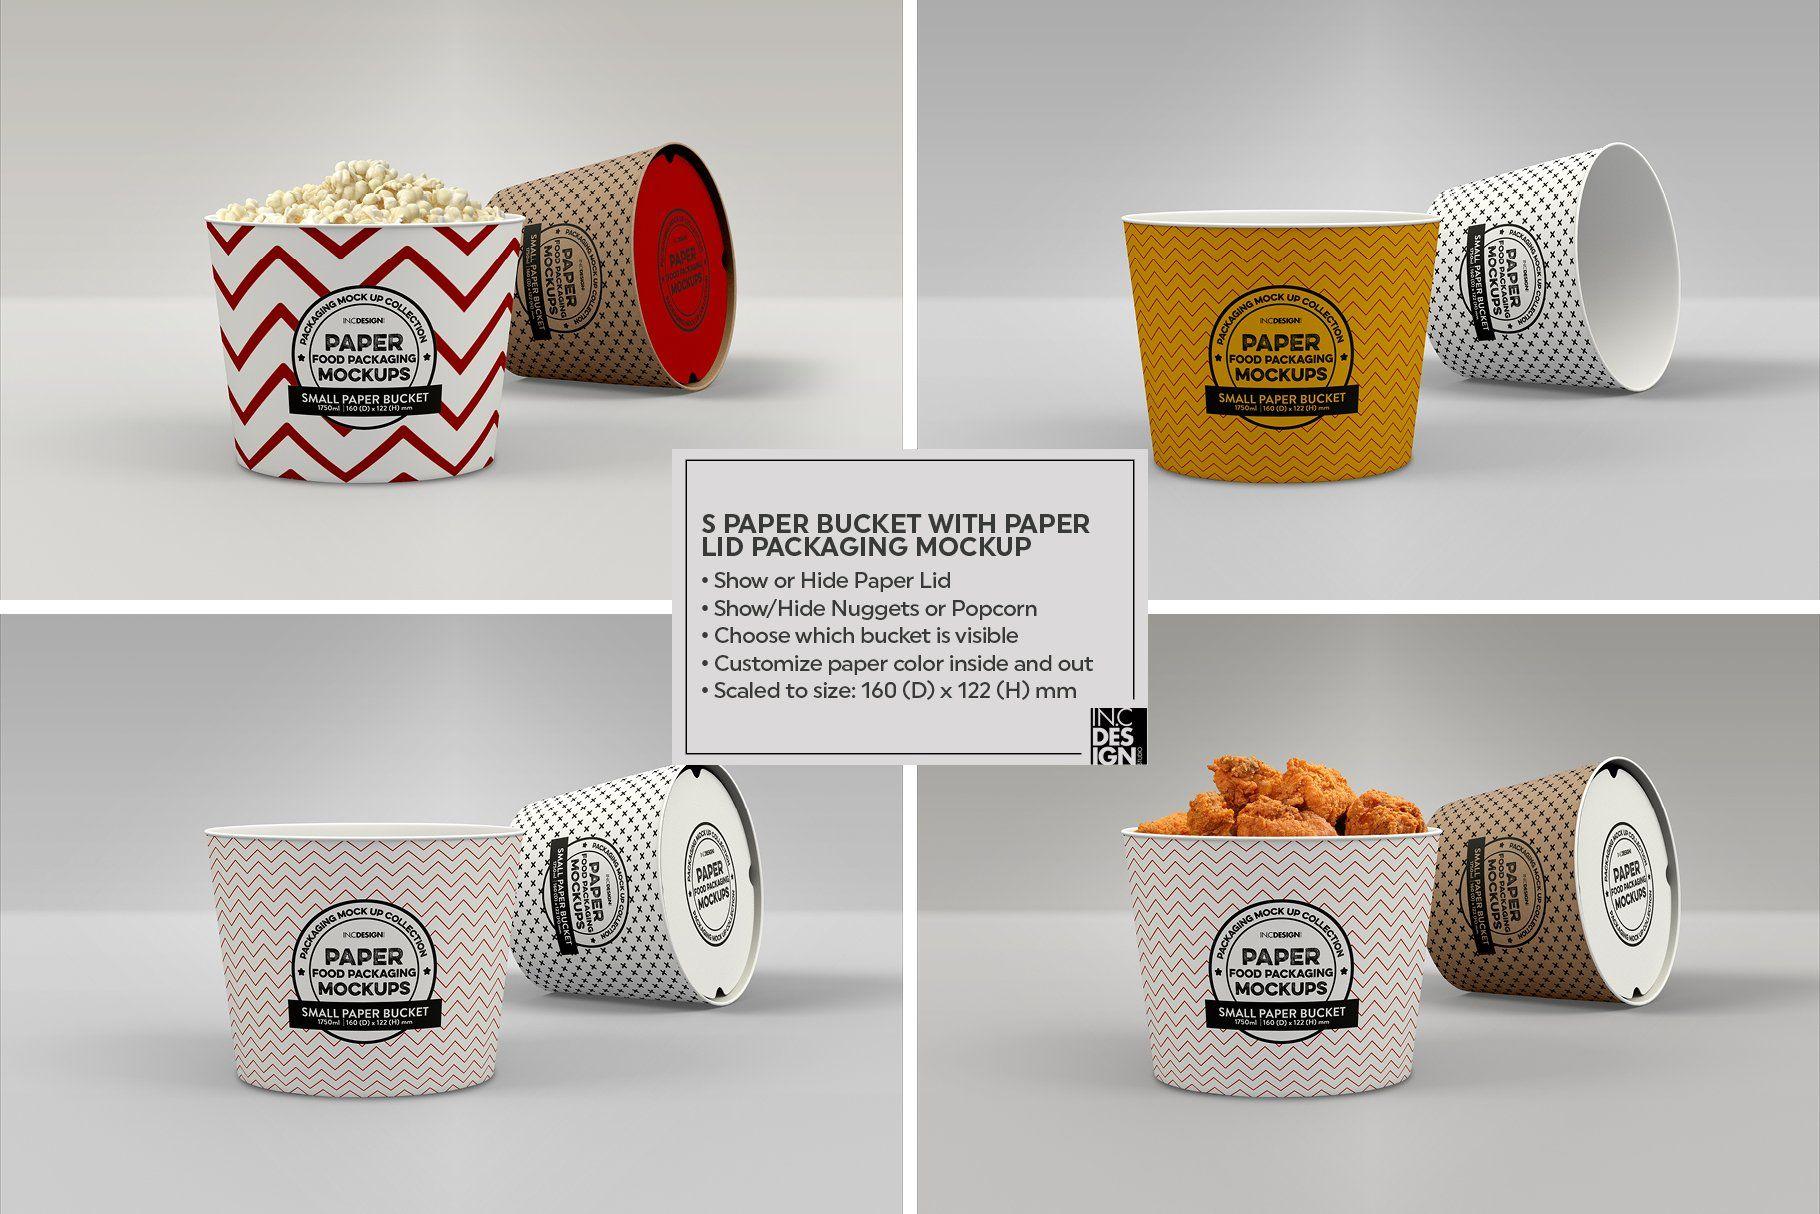 Download Vol 12 Food Box Packaging Mockups Food Box Packaging Packaging Mockup Free Packaging Mockup